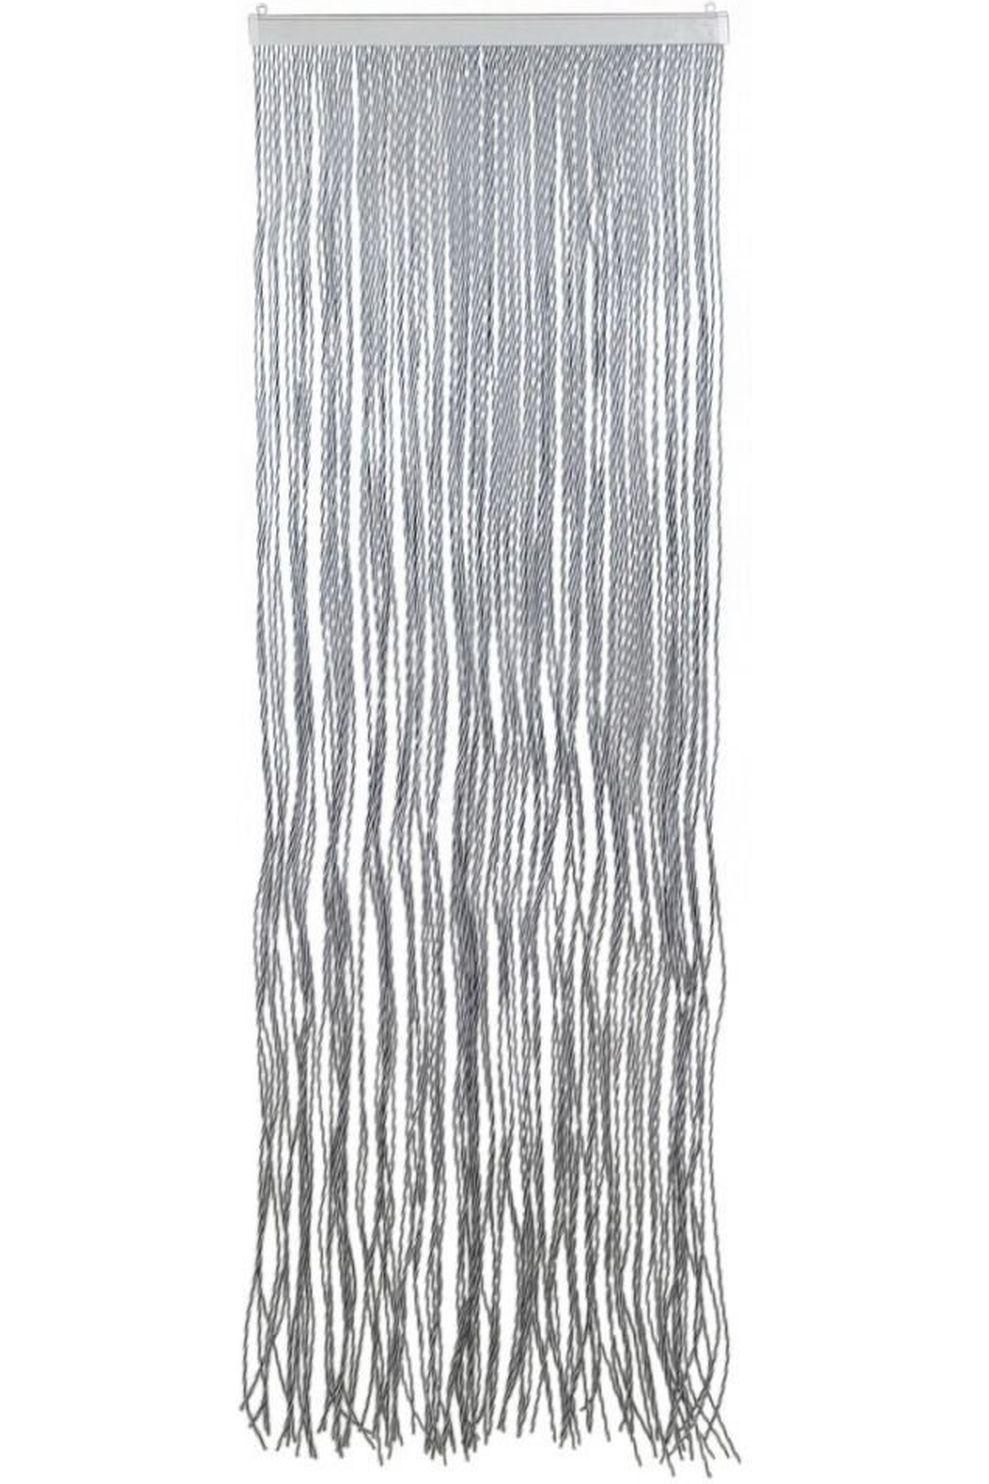 Arisol Accessoire Vliegengordijn String 220X100 Cm - Grijs/Wit